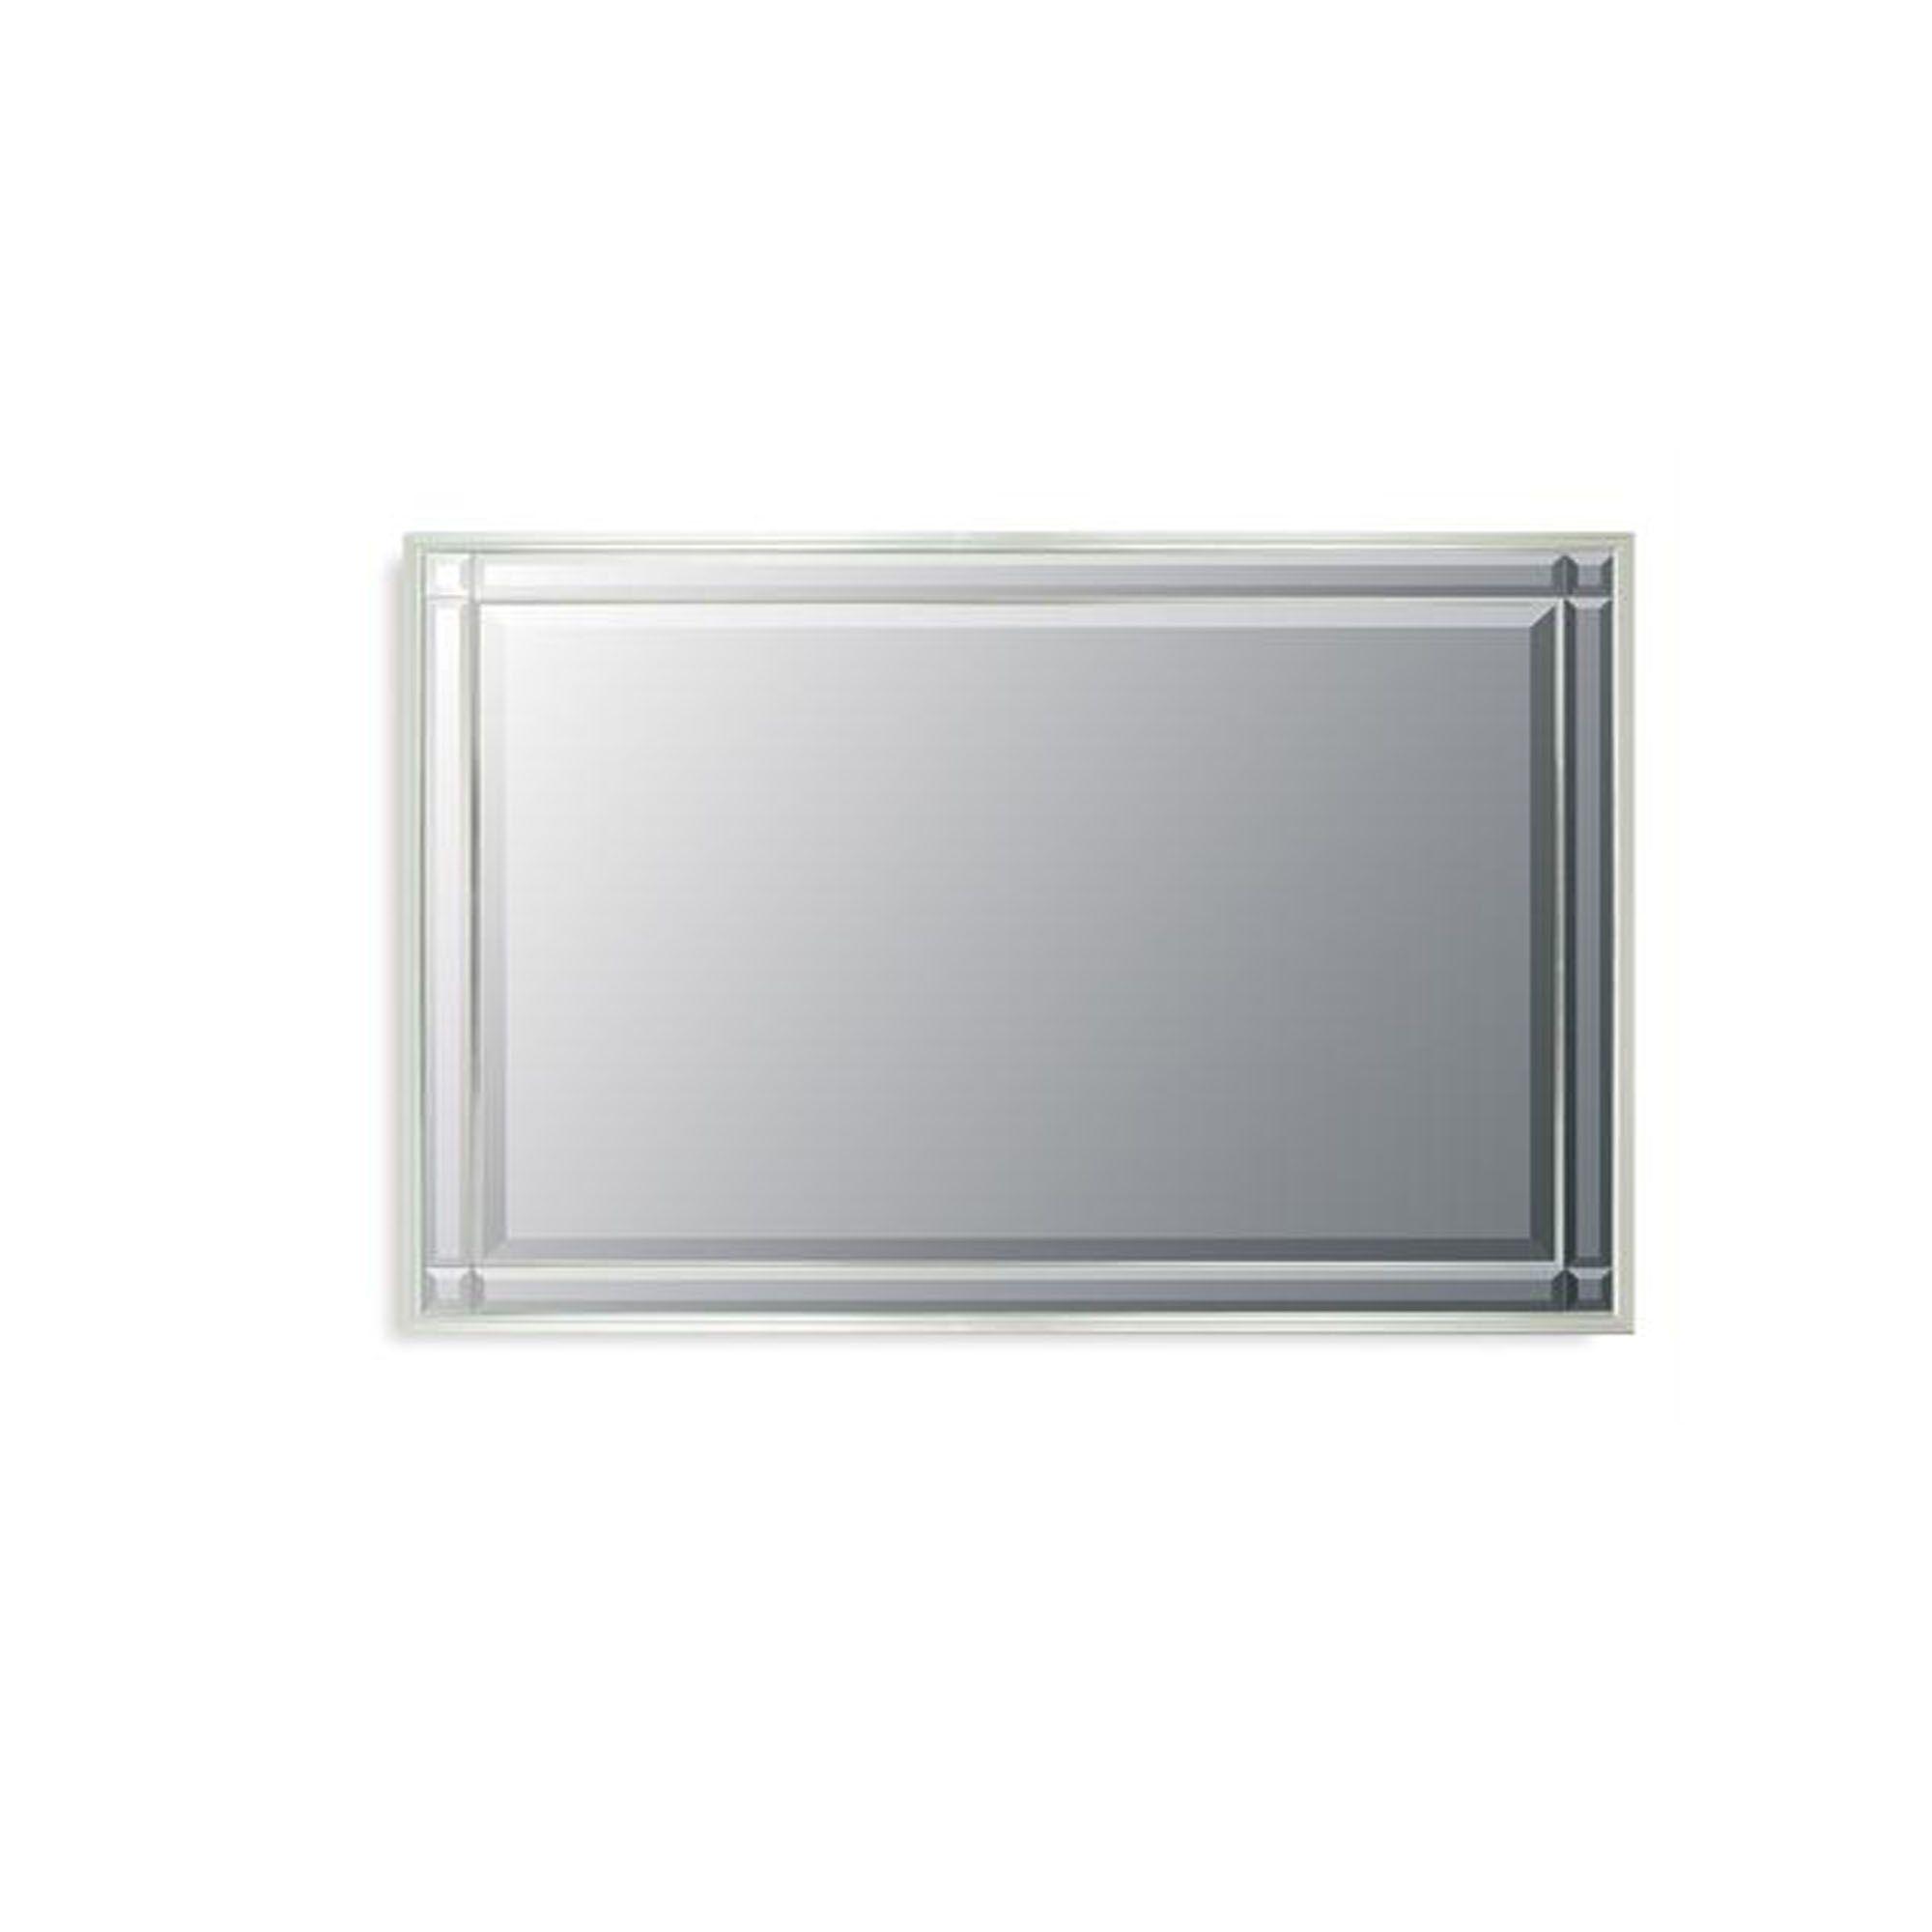 Midland mirrors silver framed mirror wall mirrors for Silver framed mirror